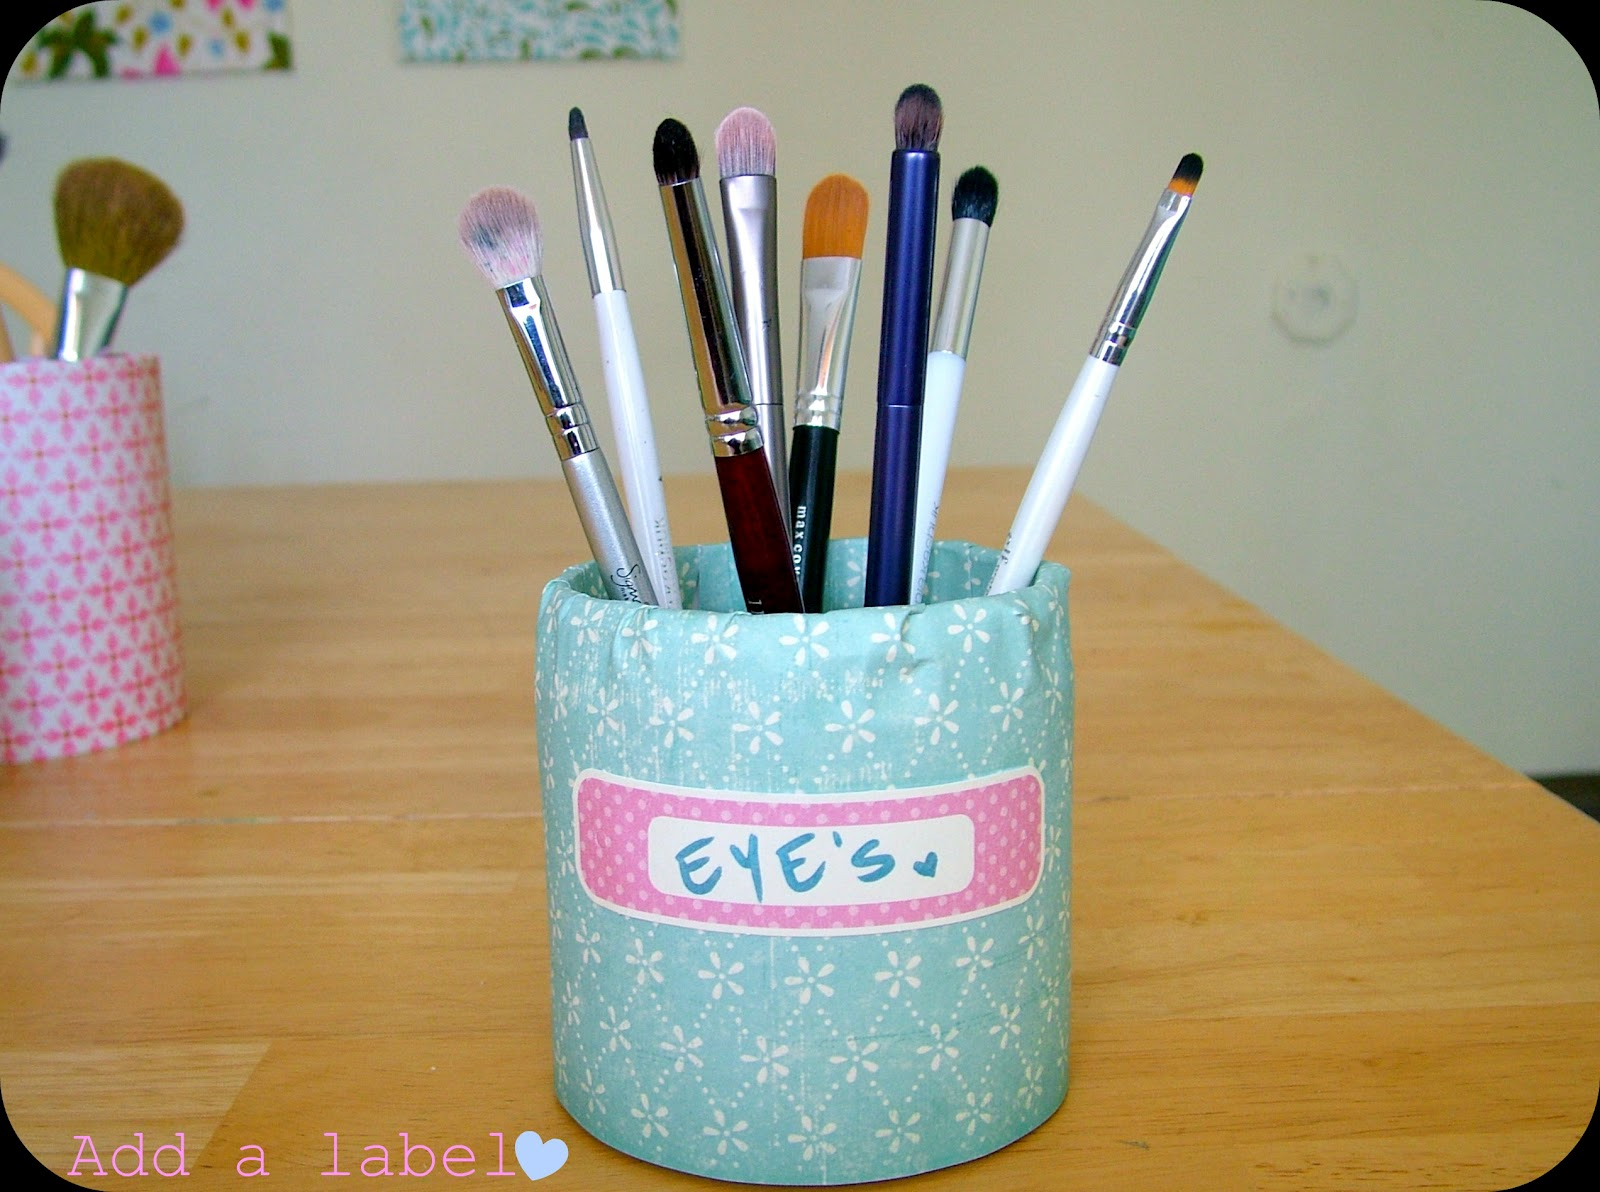 chelli glam vixen 1 dollar makeup brush holders. Black Bedroom Furniture Sets. Home Design Ideas